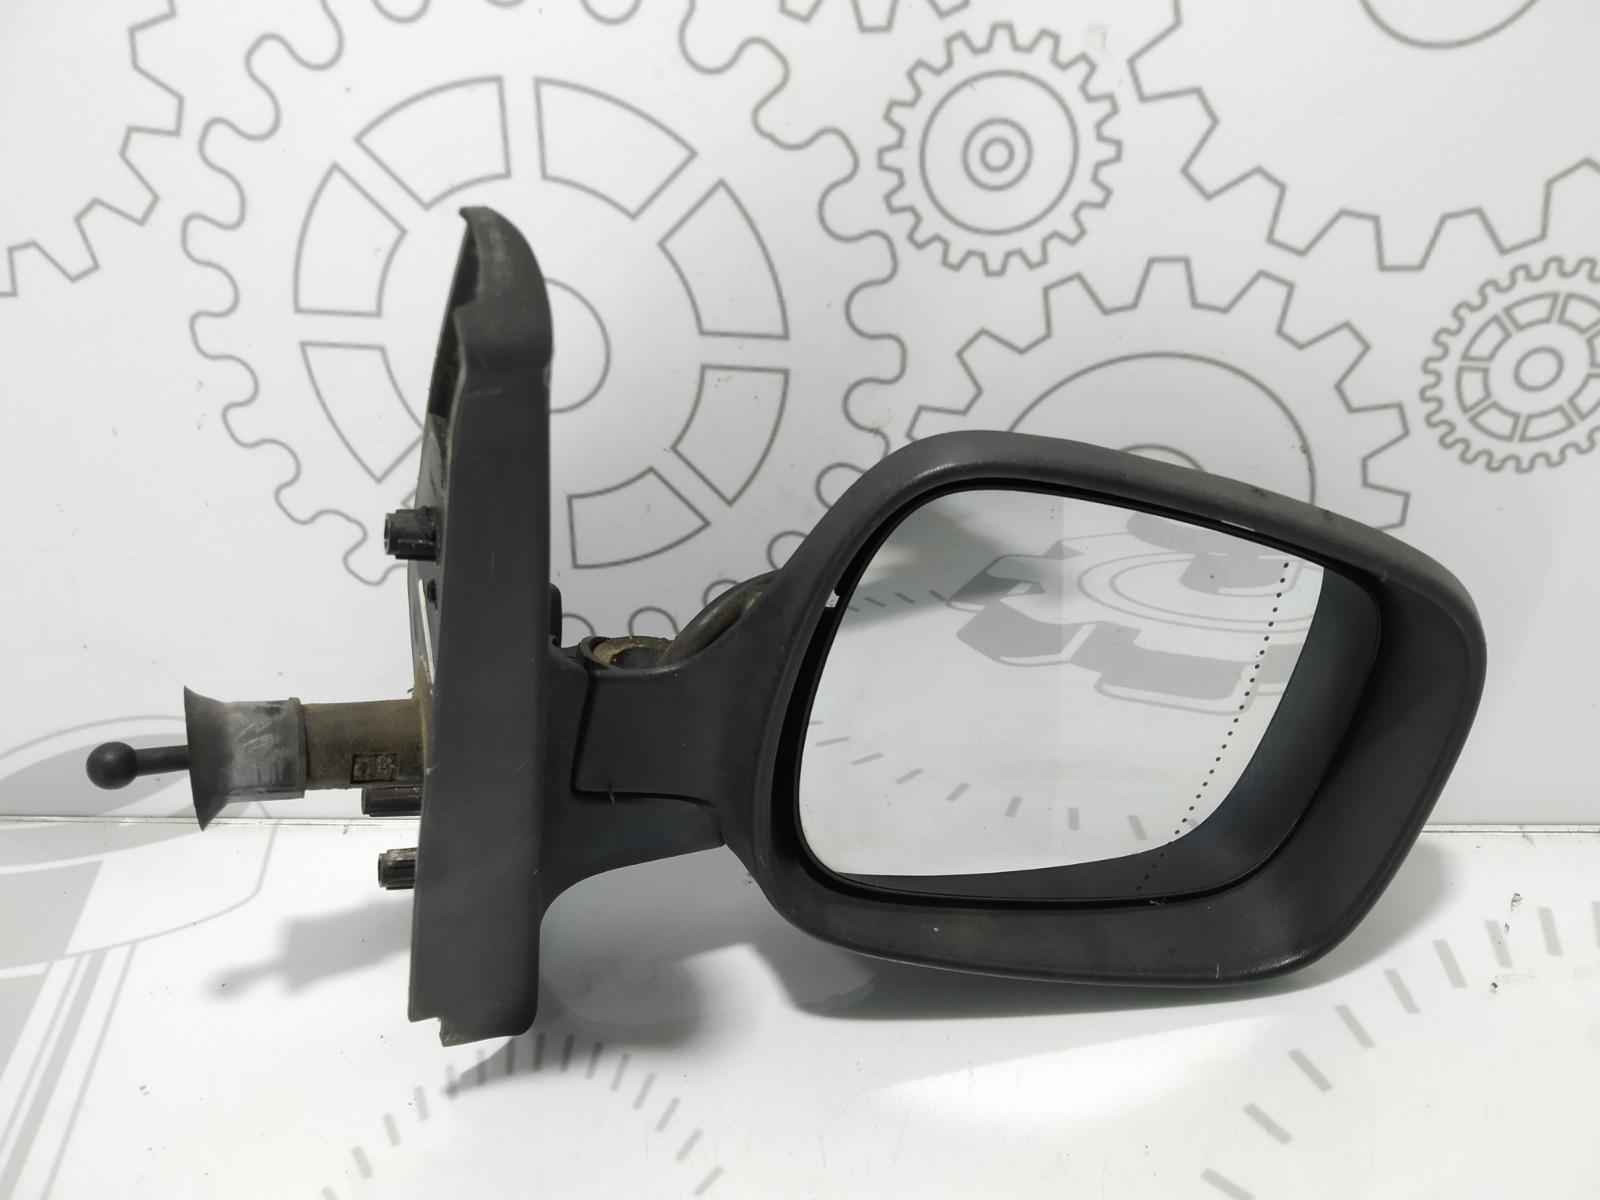 Зеркало наружное правое Renault Kangoo 1.2 I 2007 (б/у)